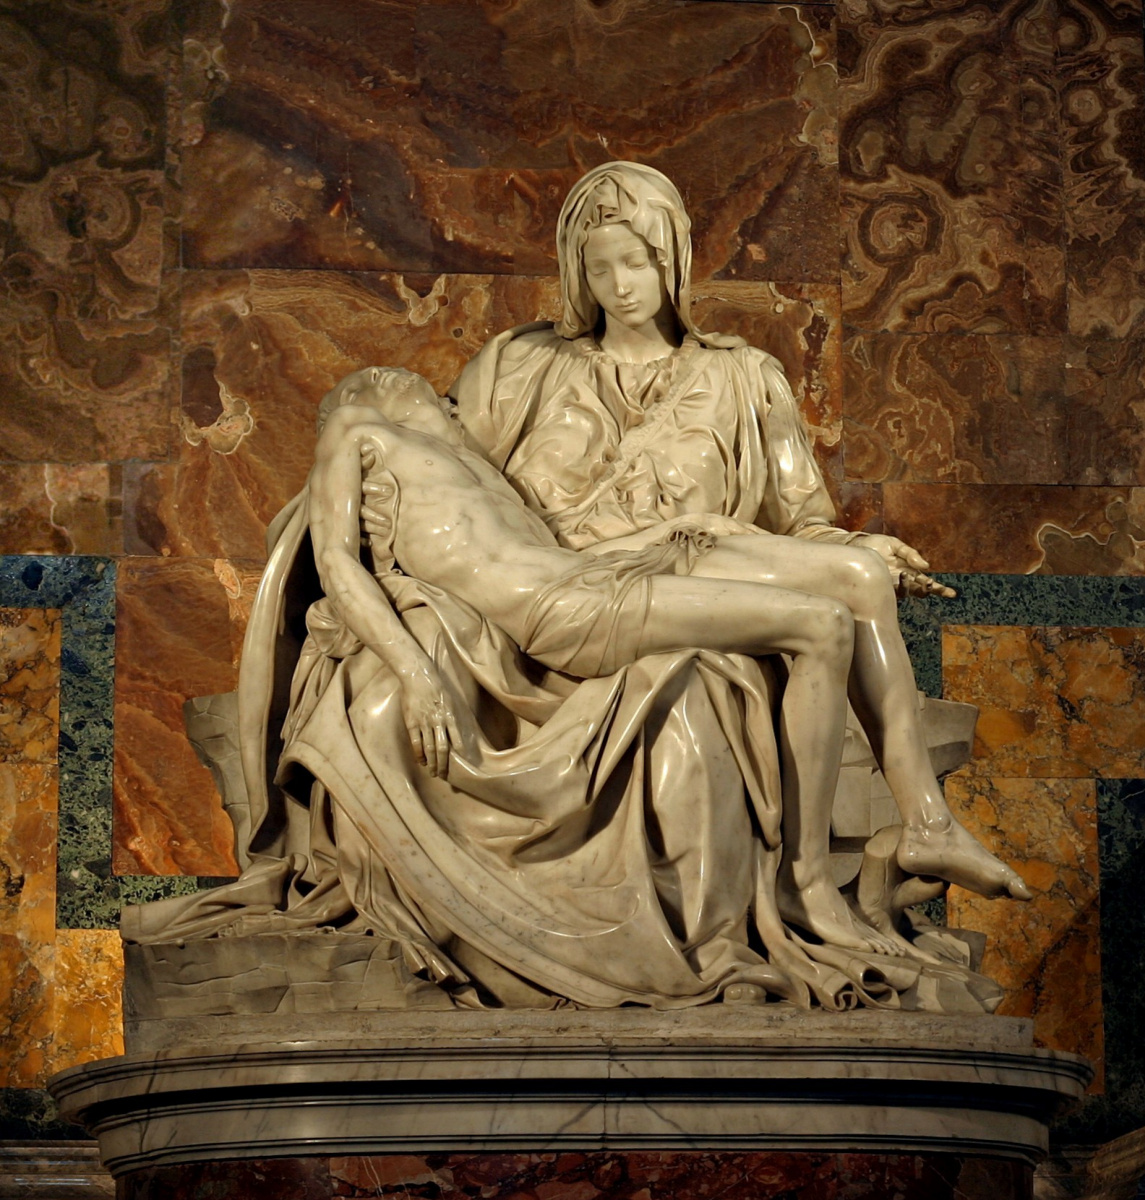 Michelangelo Buonarroti. Pieta (Lamentation Of Christ)